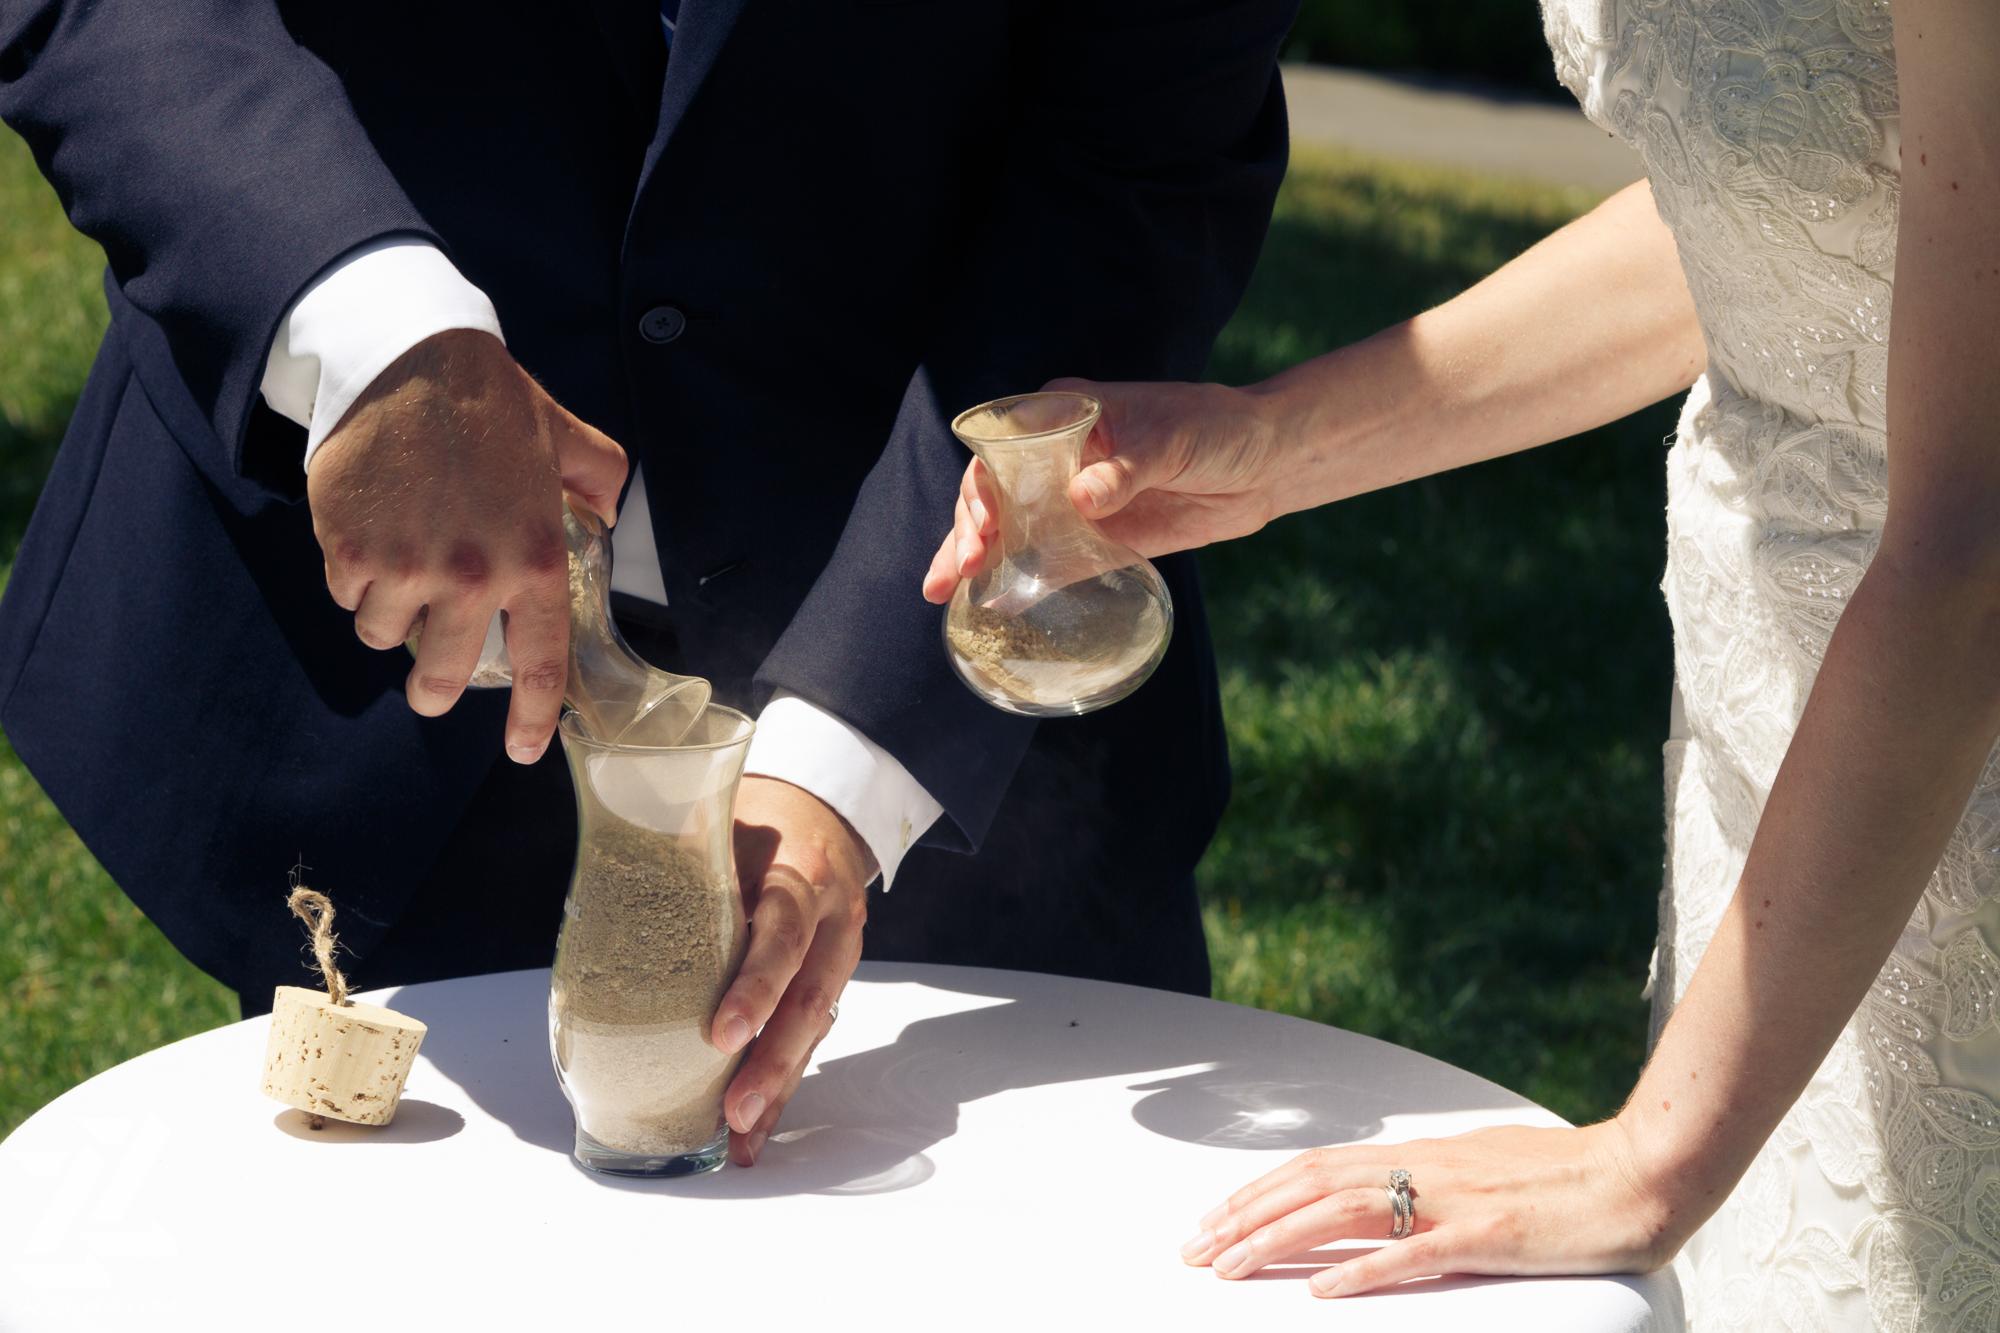 scranton-wedding-photography-zak-zavada-ruddyBelcastroWedding-350.jpg